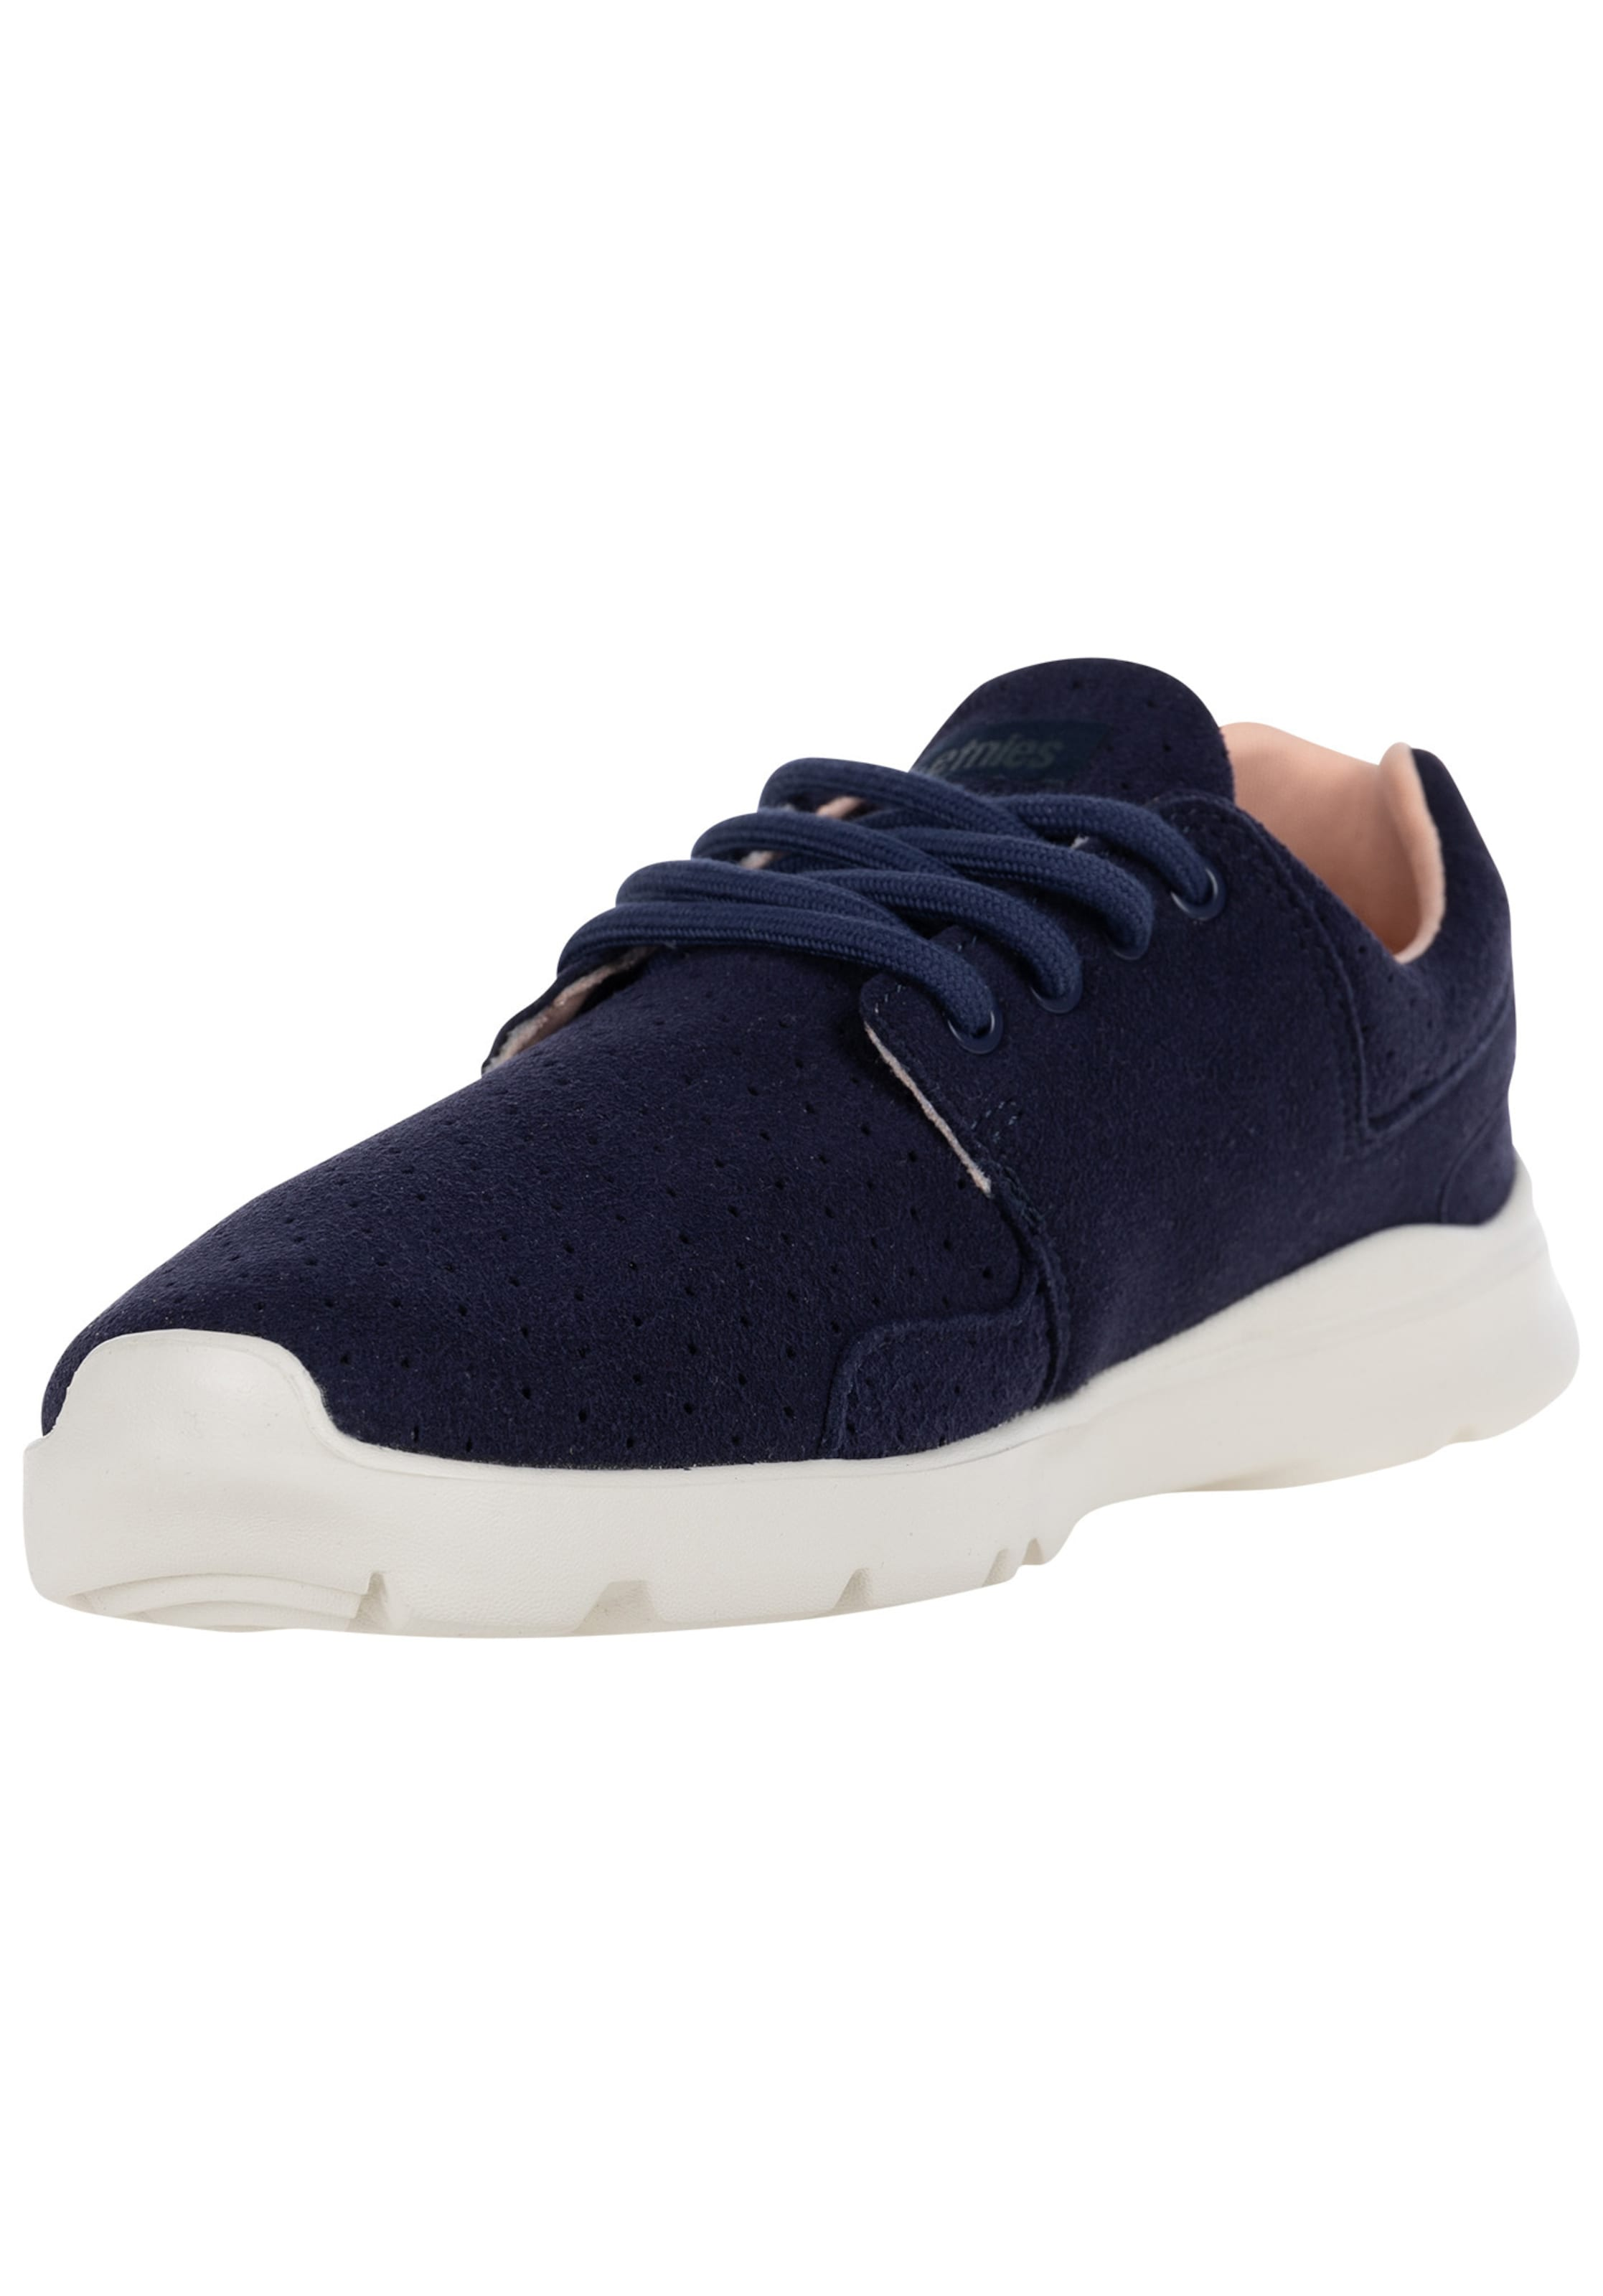 NavyWeiß In Etnies Sneaker Xt' 'scout qSMUVGzp